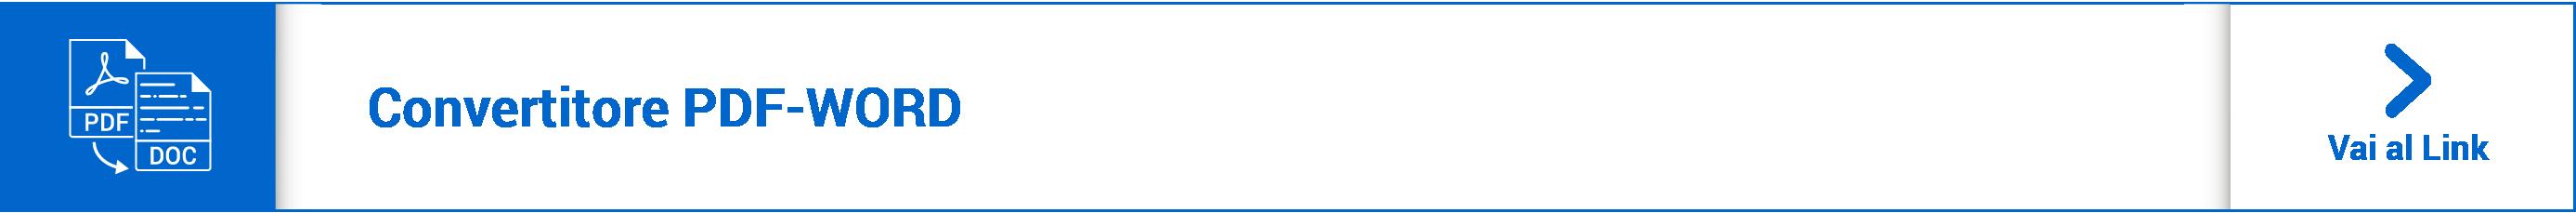 convertitorepdftoword